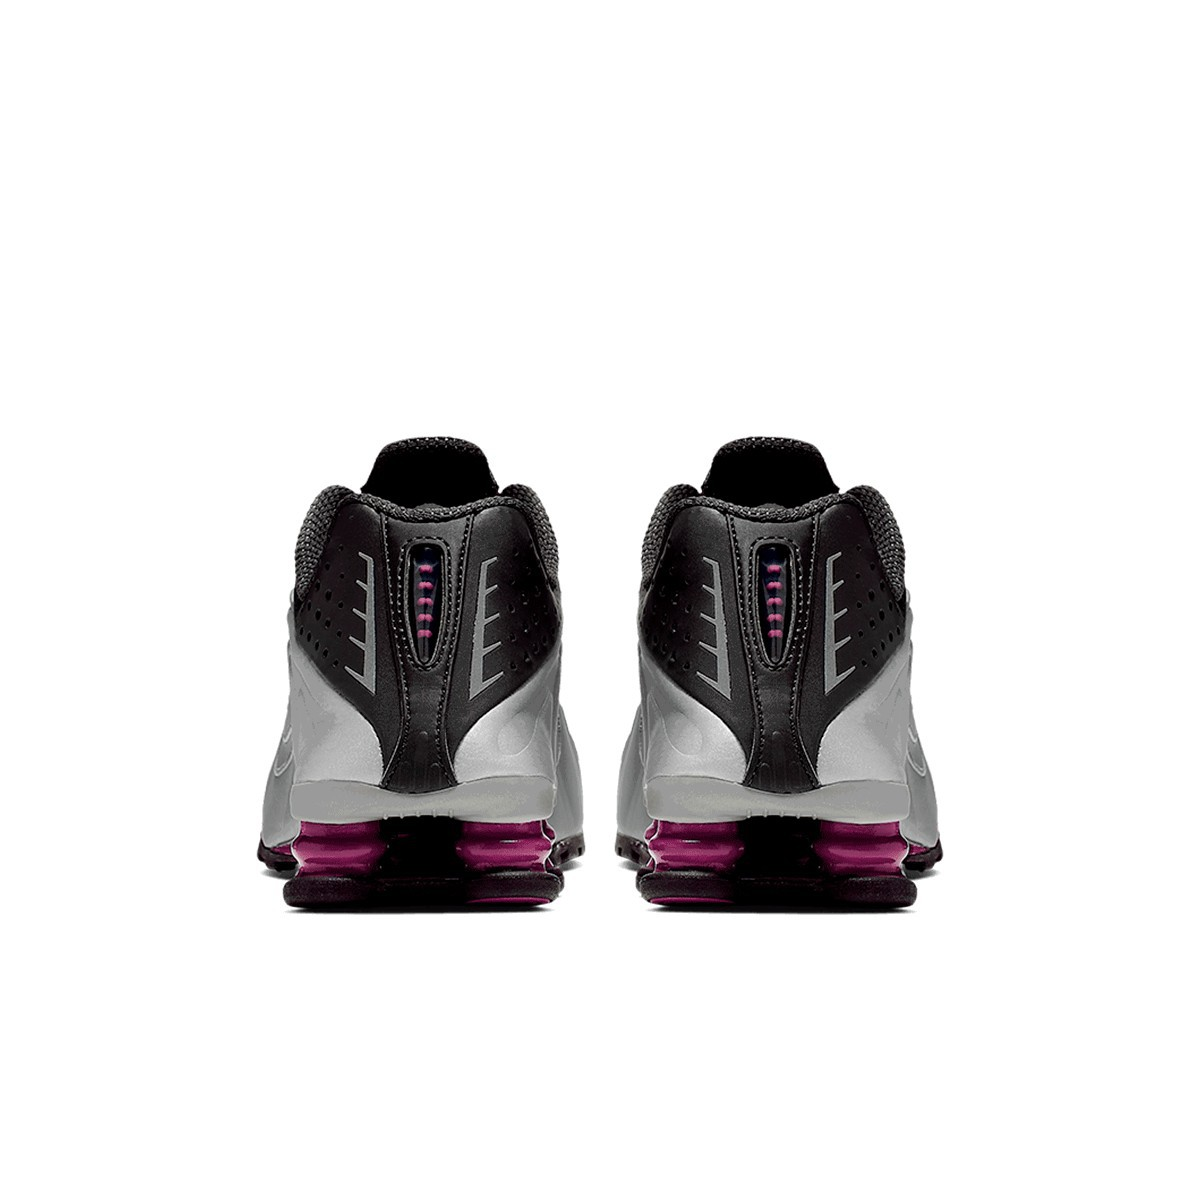 Tênis Nike Shox R4 Feminino Prata Roxo